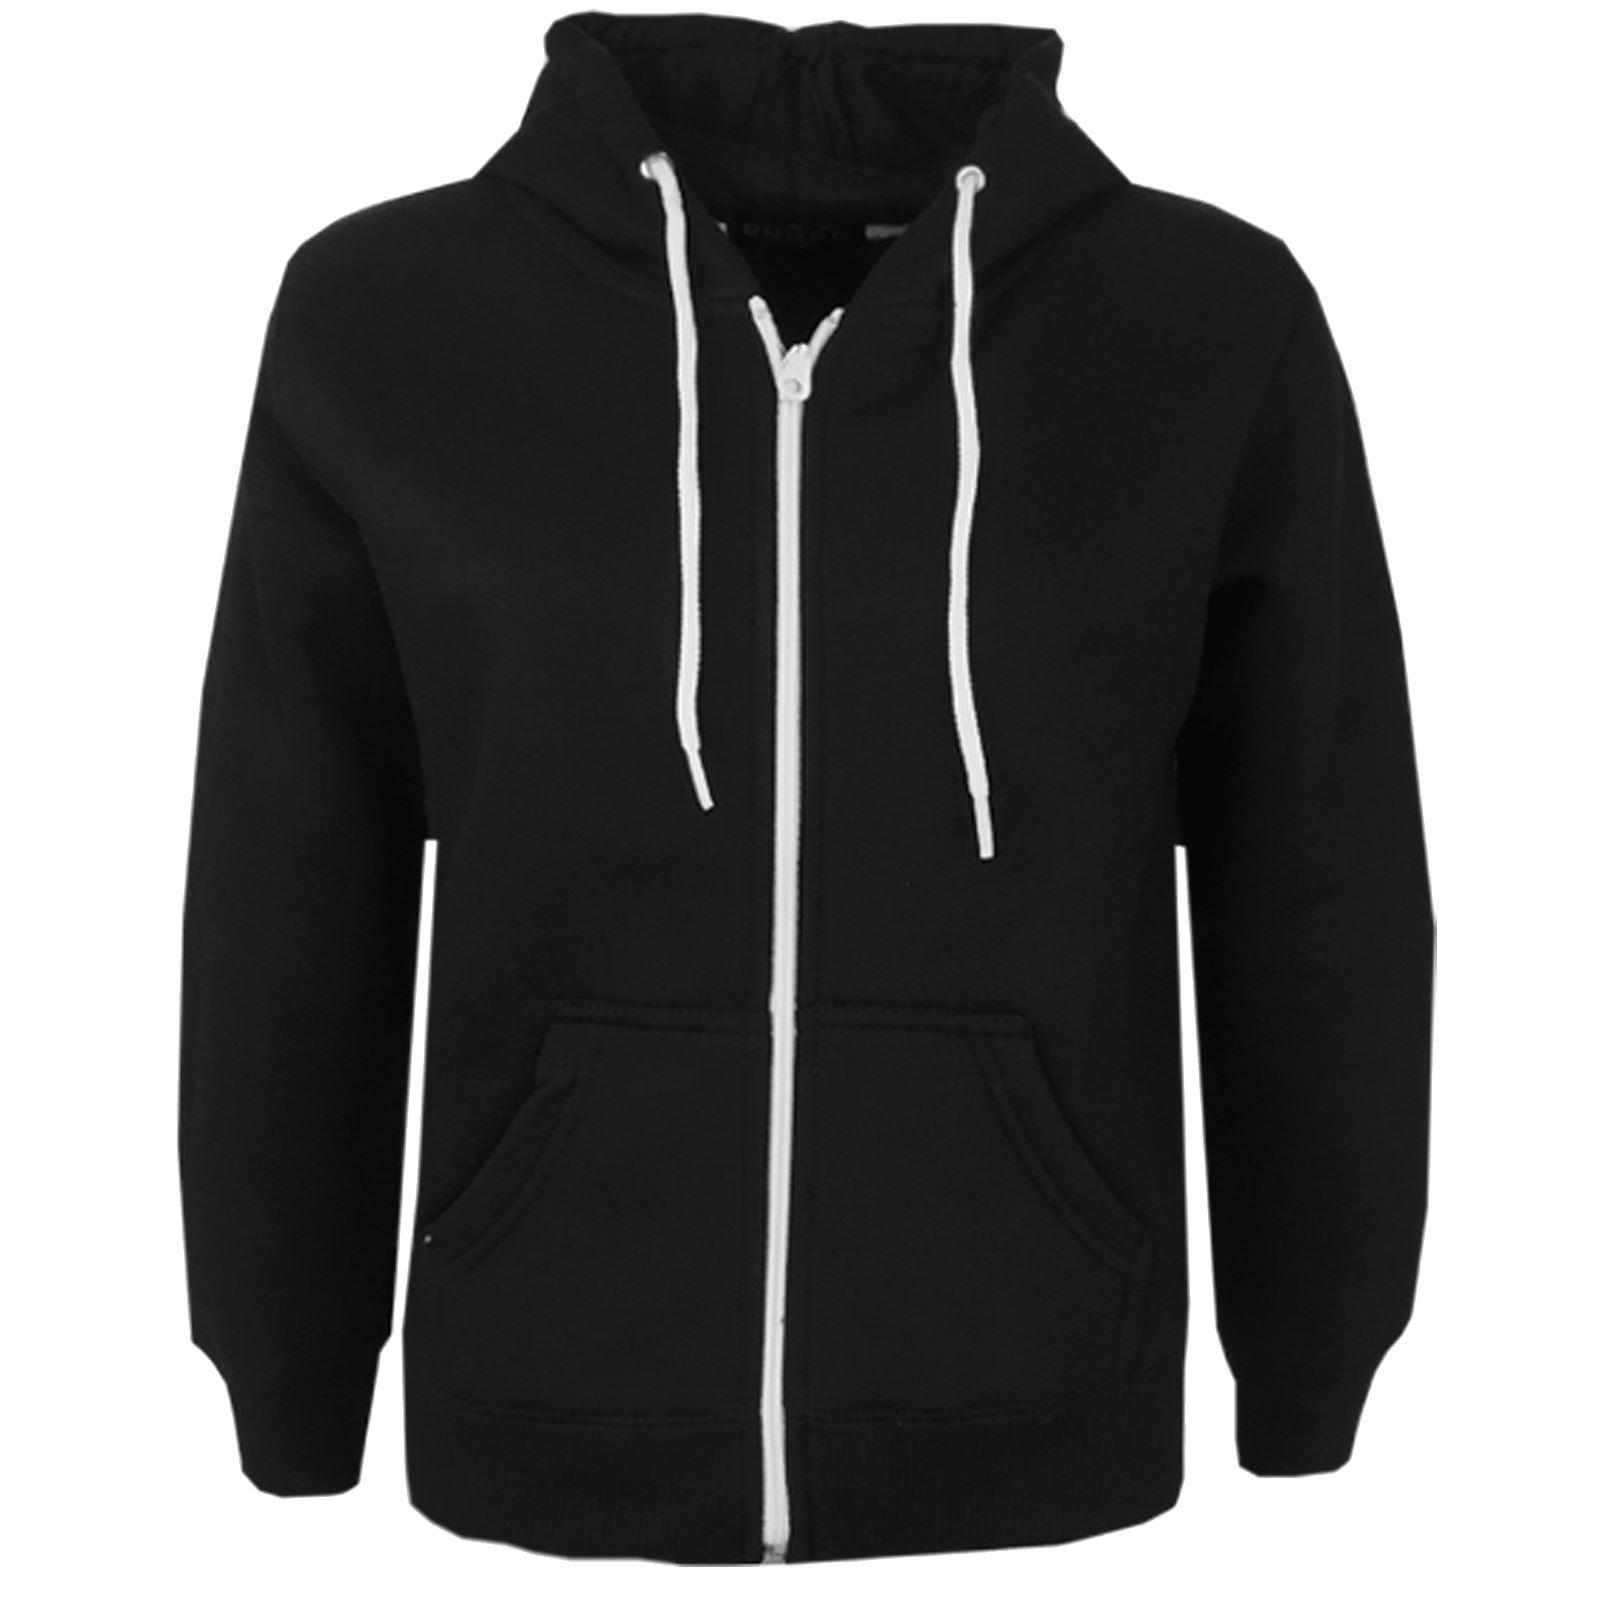 kids children girls boys zip up plain hoodie jacket hooded zipper  sweatshirt lsvofnz